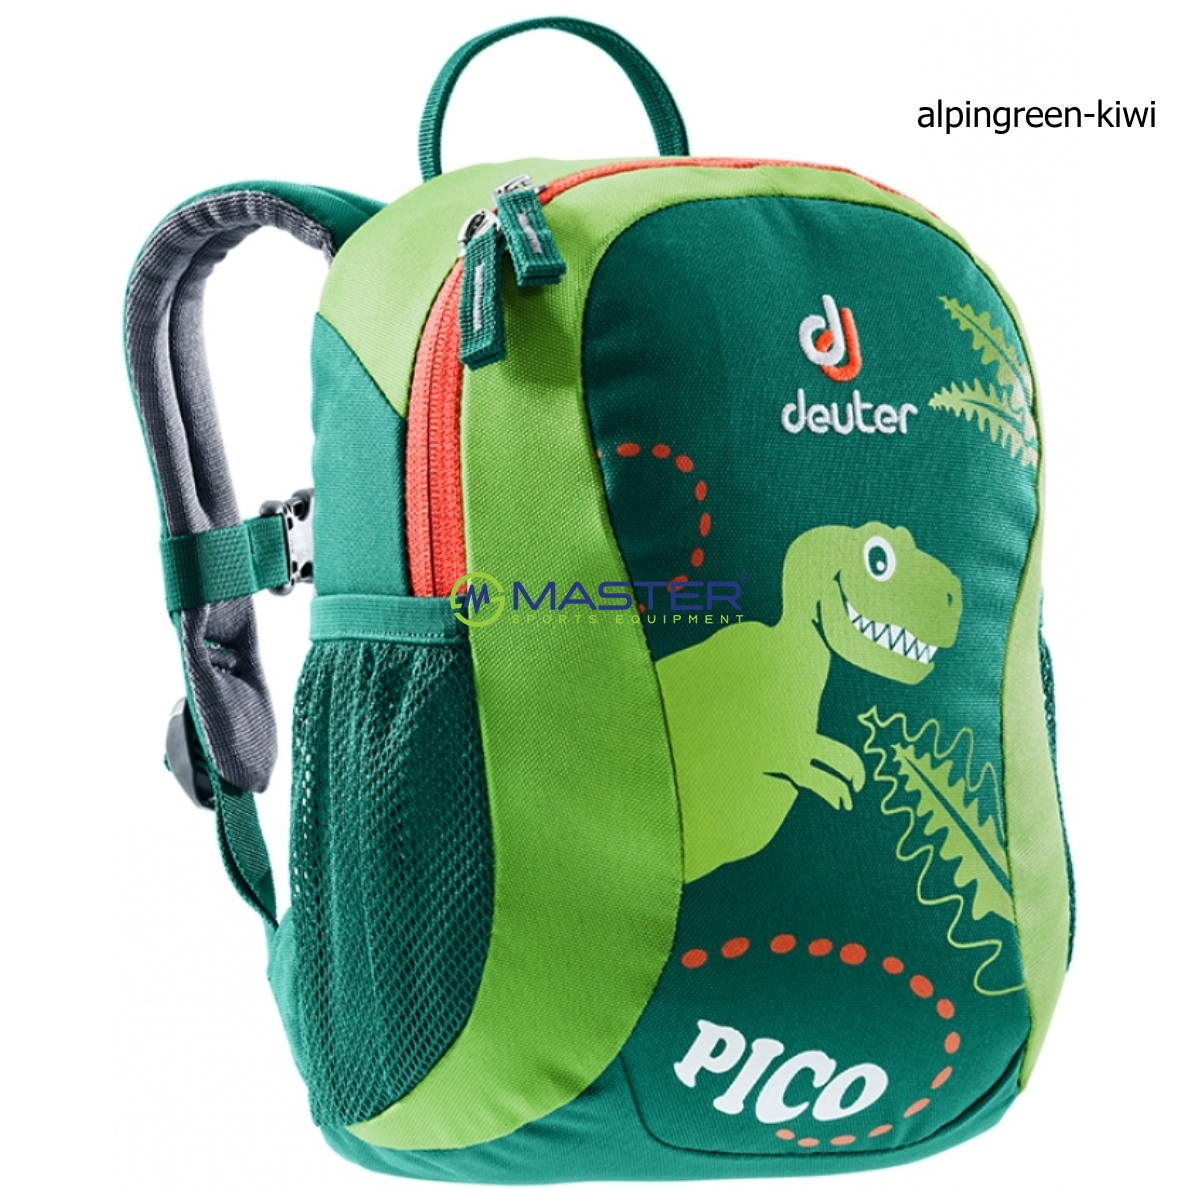 ca38c22c217 Dětský batoh DEUTER Pico 5 l - alpinegreen-kiwi